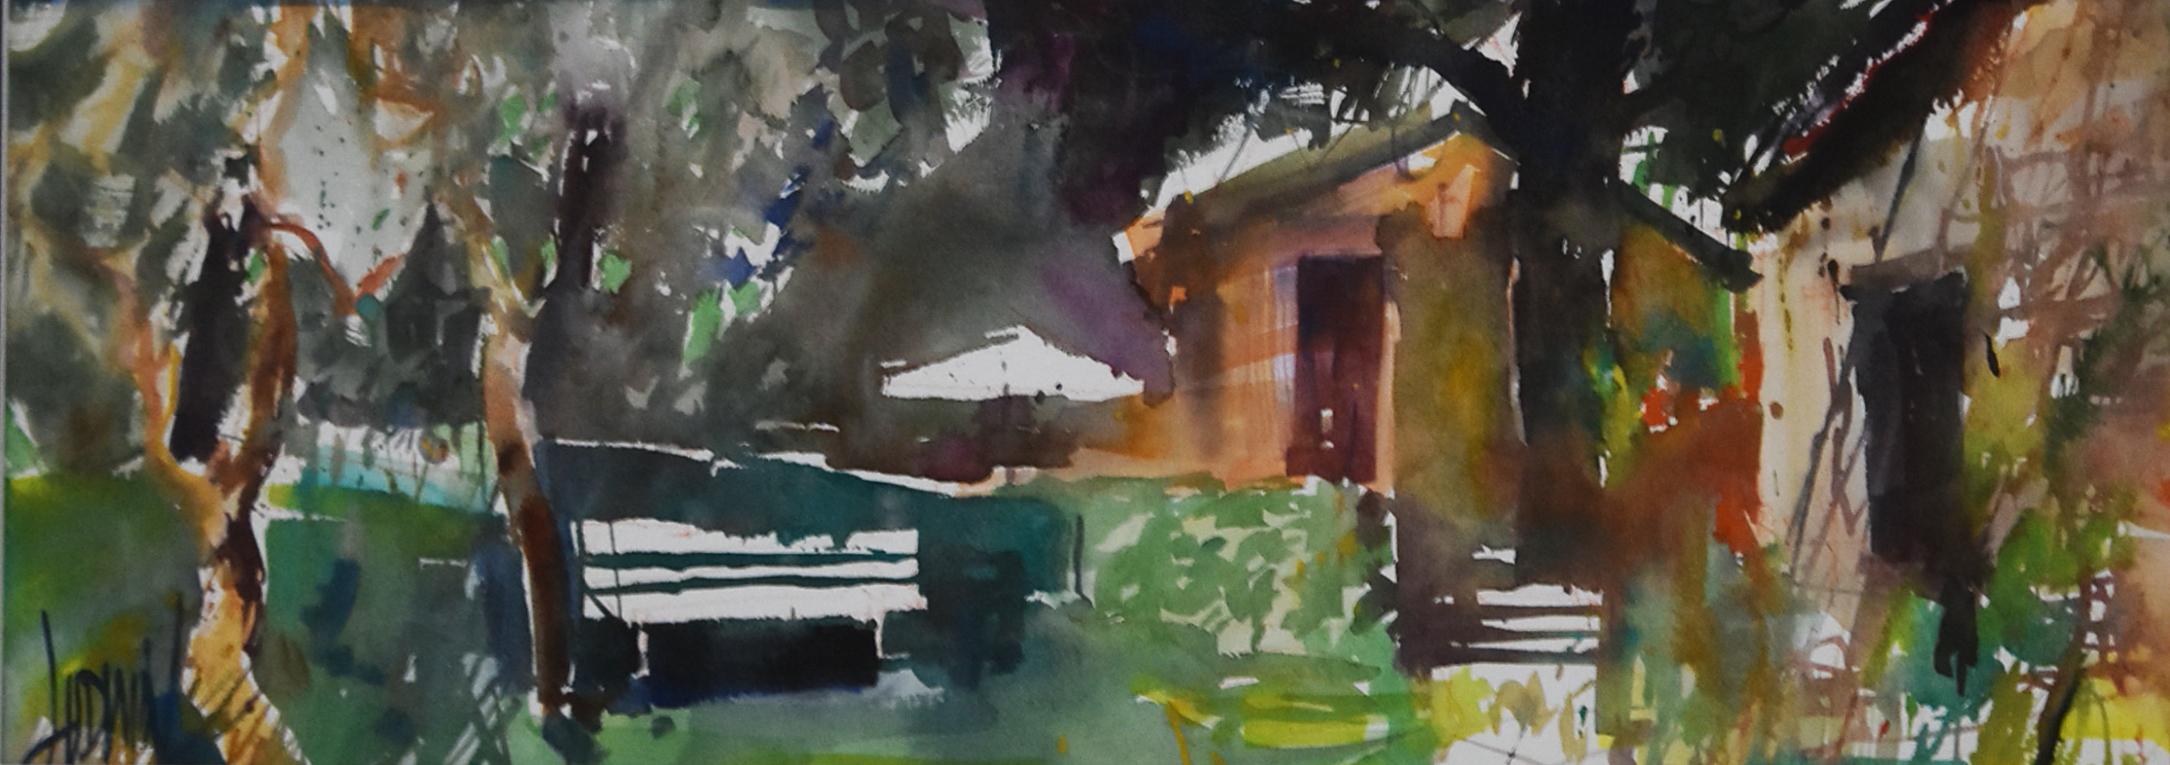 Toskania-ciche malowanie, 2018